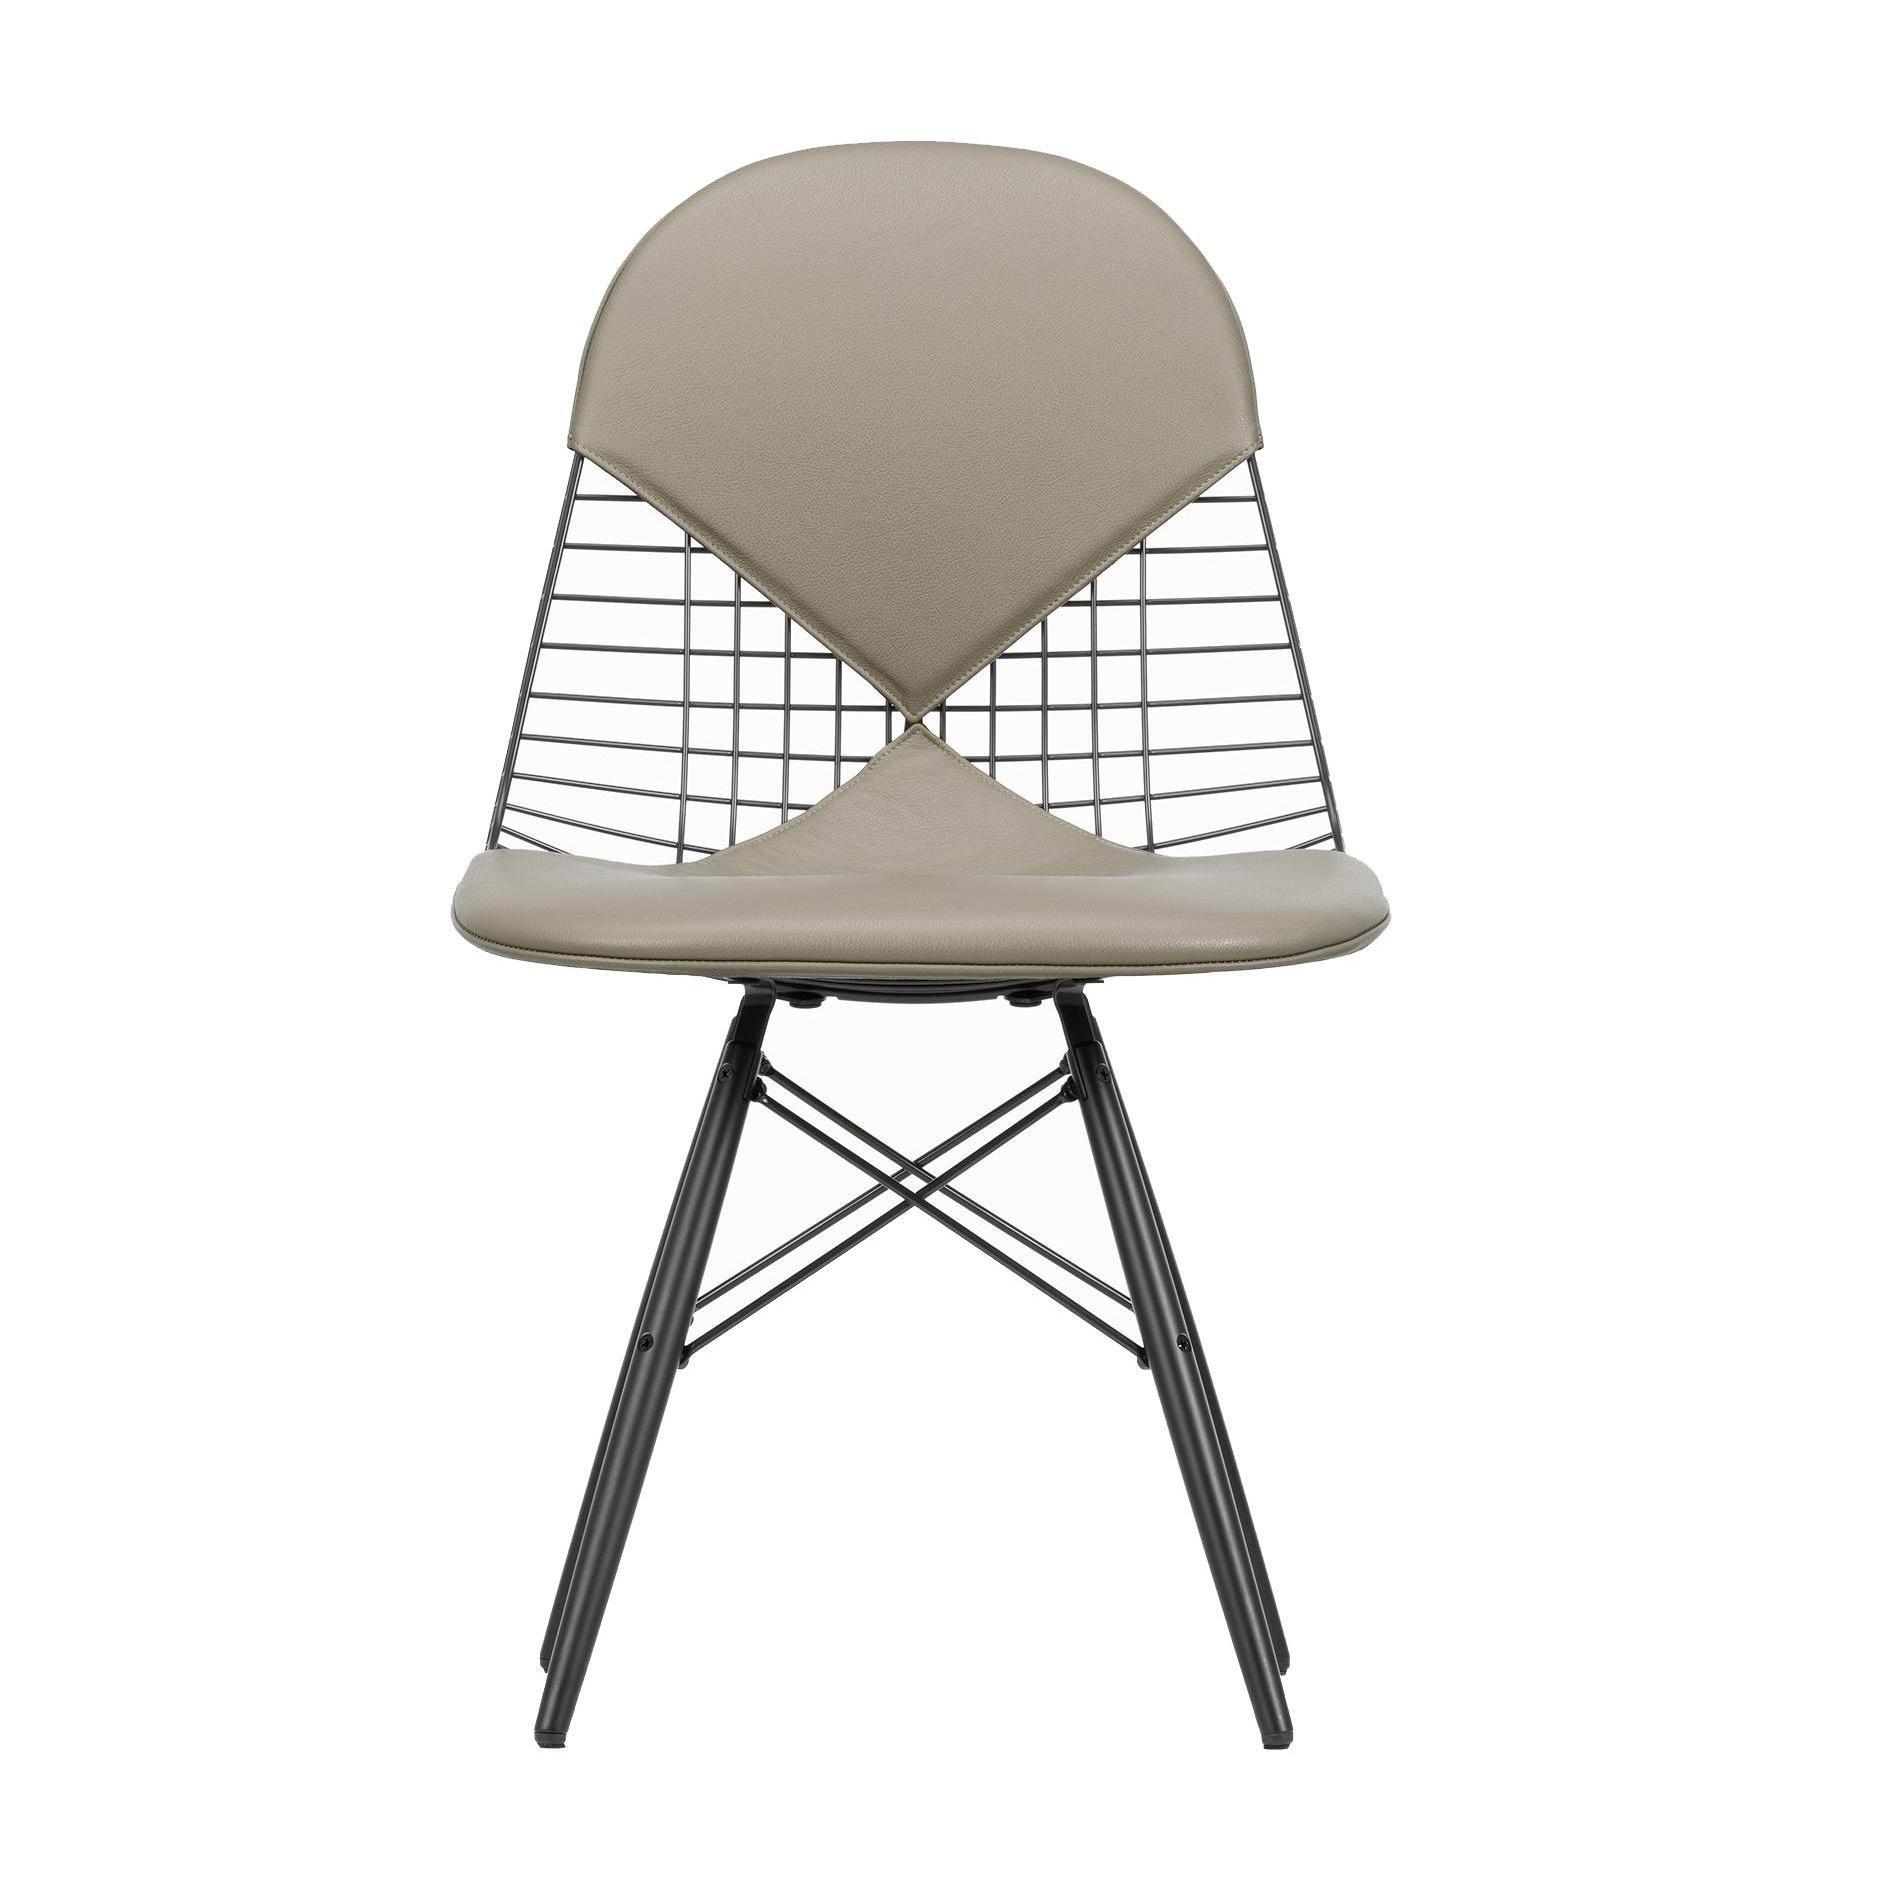 Chair Wire DKW Chair Chaise DKW 2 2 Chaise Wire 6gvYbf7y